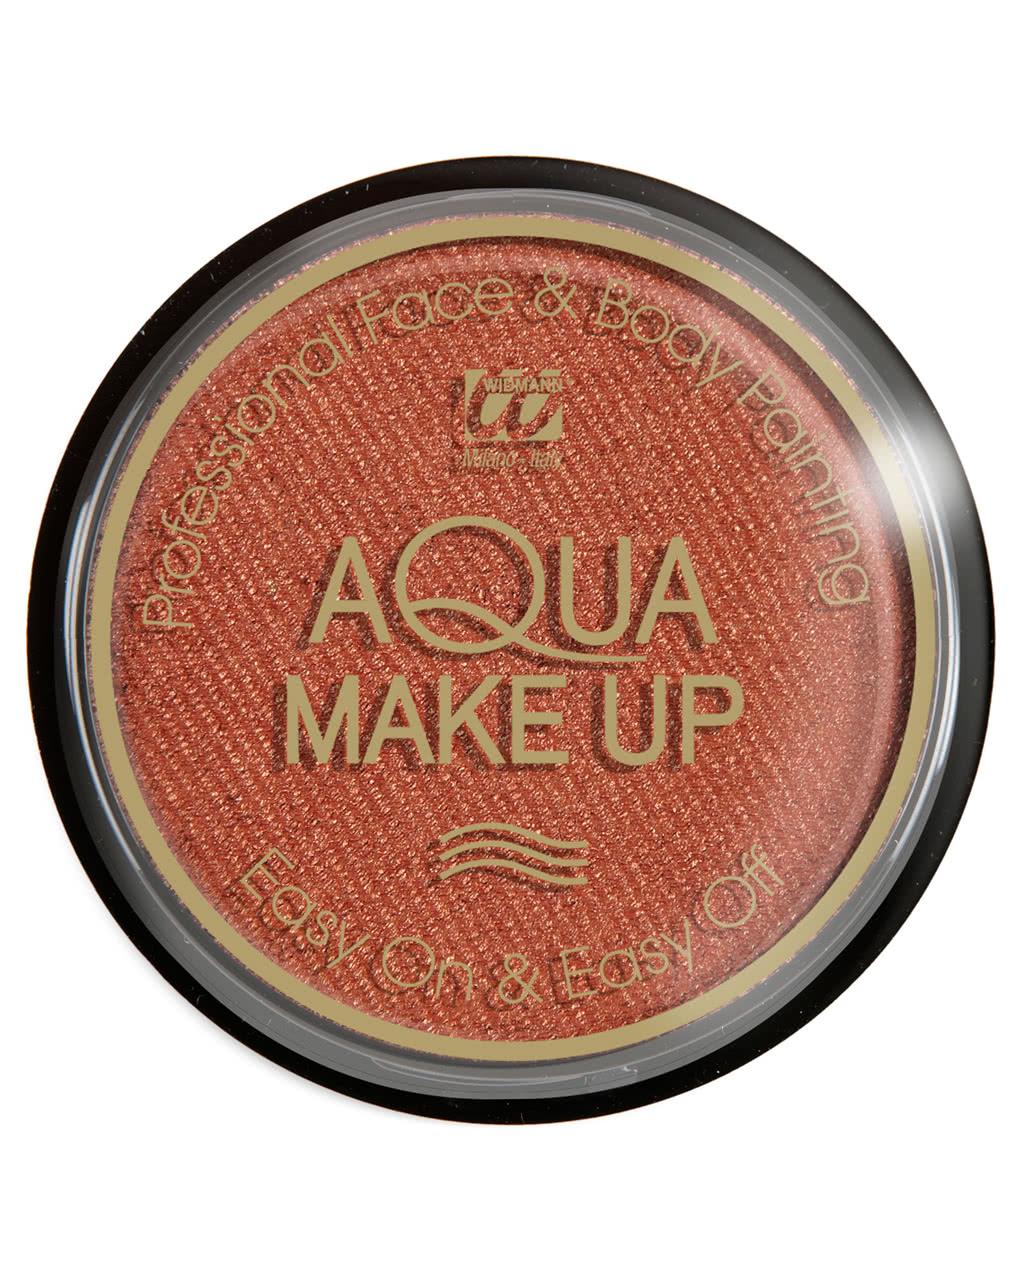 aqua make up bronze bronzeg nzendes makeup horror. Black Bedroom Furniture Sets. Home Design Ideas